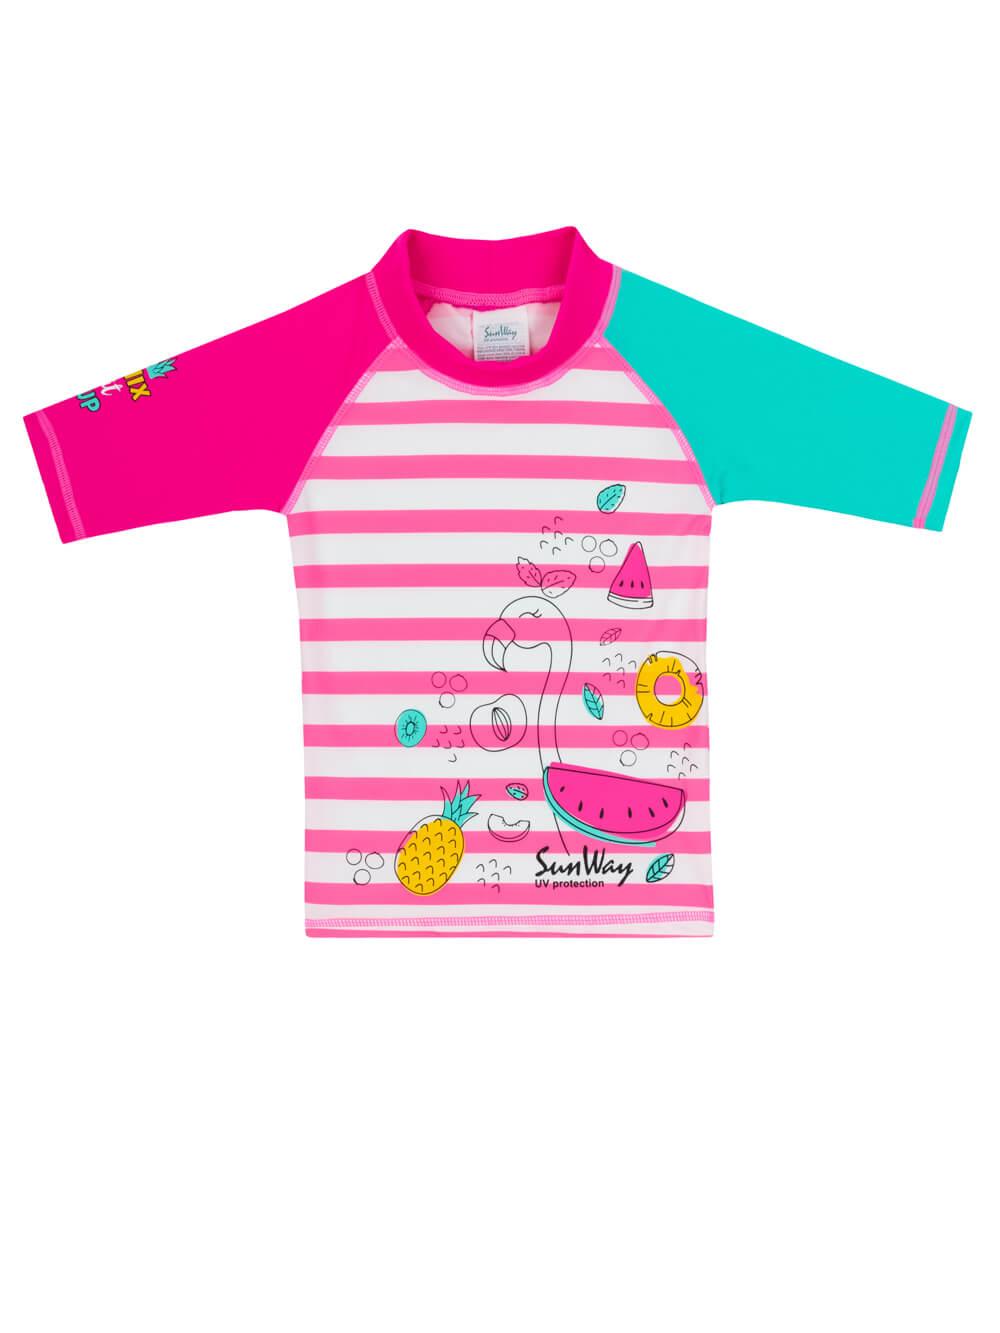 Flamingo swim shirt. Swim shirt rash guard 113